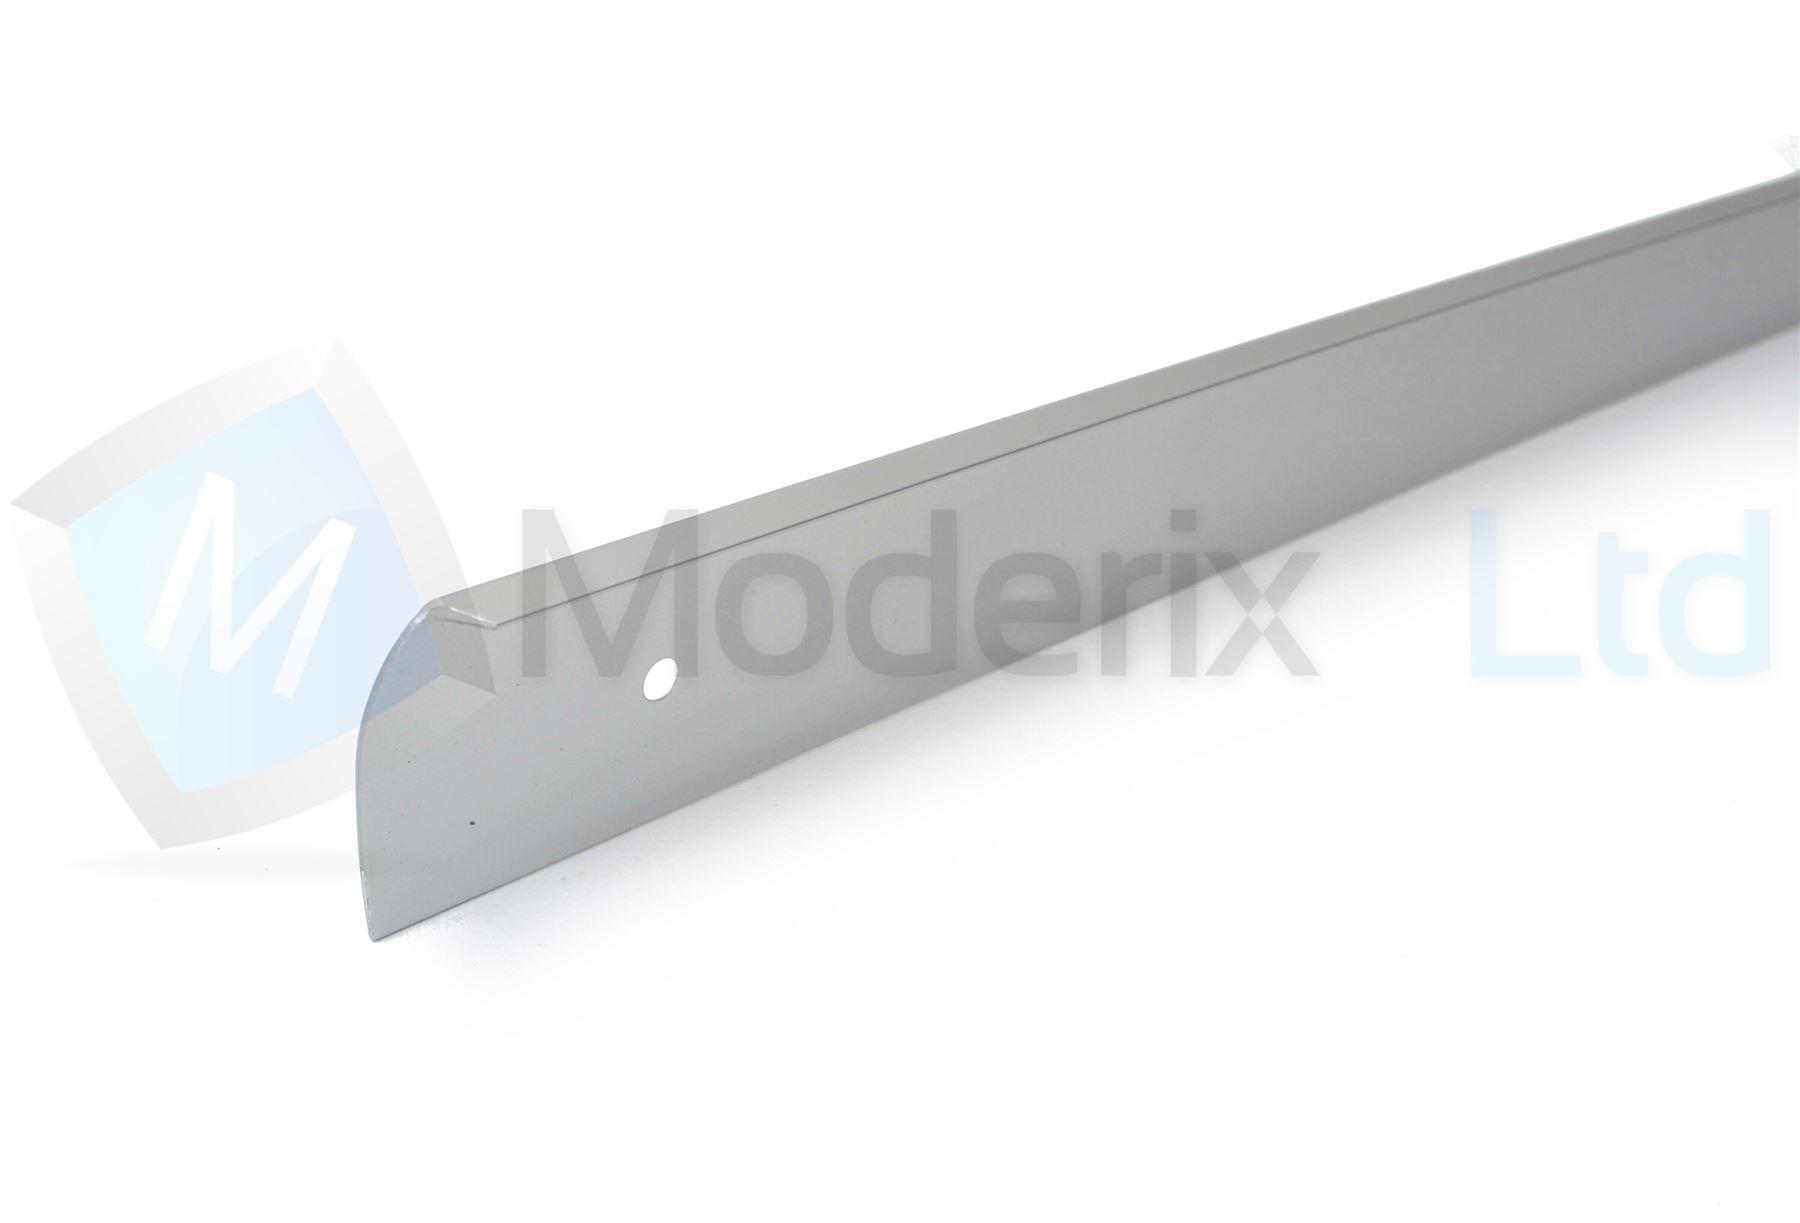 kitchen worktop edging corner joint trim strip aluminium end cap 30mm and 40mm ebay. Black Bedroom Furniture Sets. Home Design Ideas